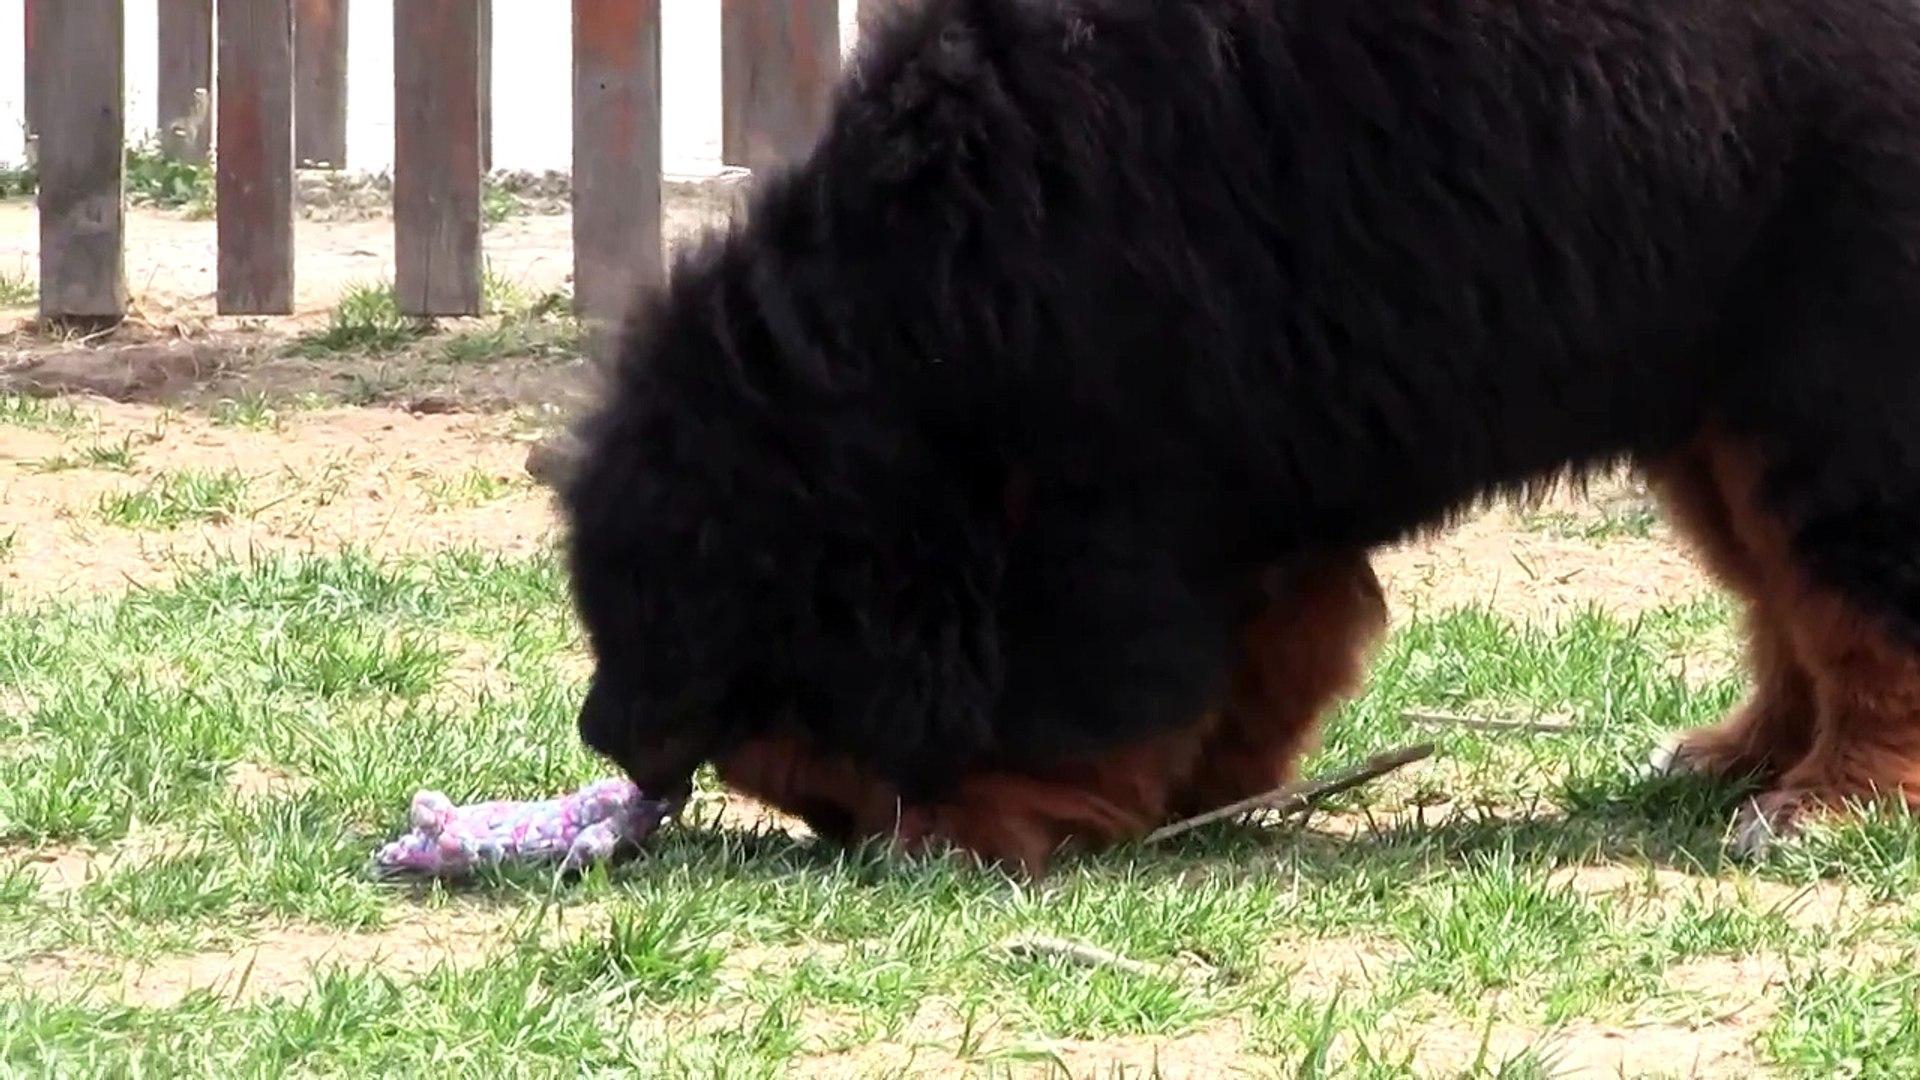 CiN ASLANI ve TiBET MASTiFi KOPEKLERi - CHOW CHOW and TiBETiAN MASTiFF DOGS